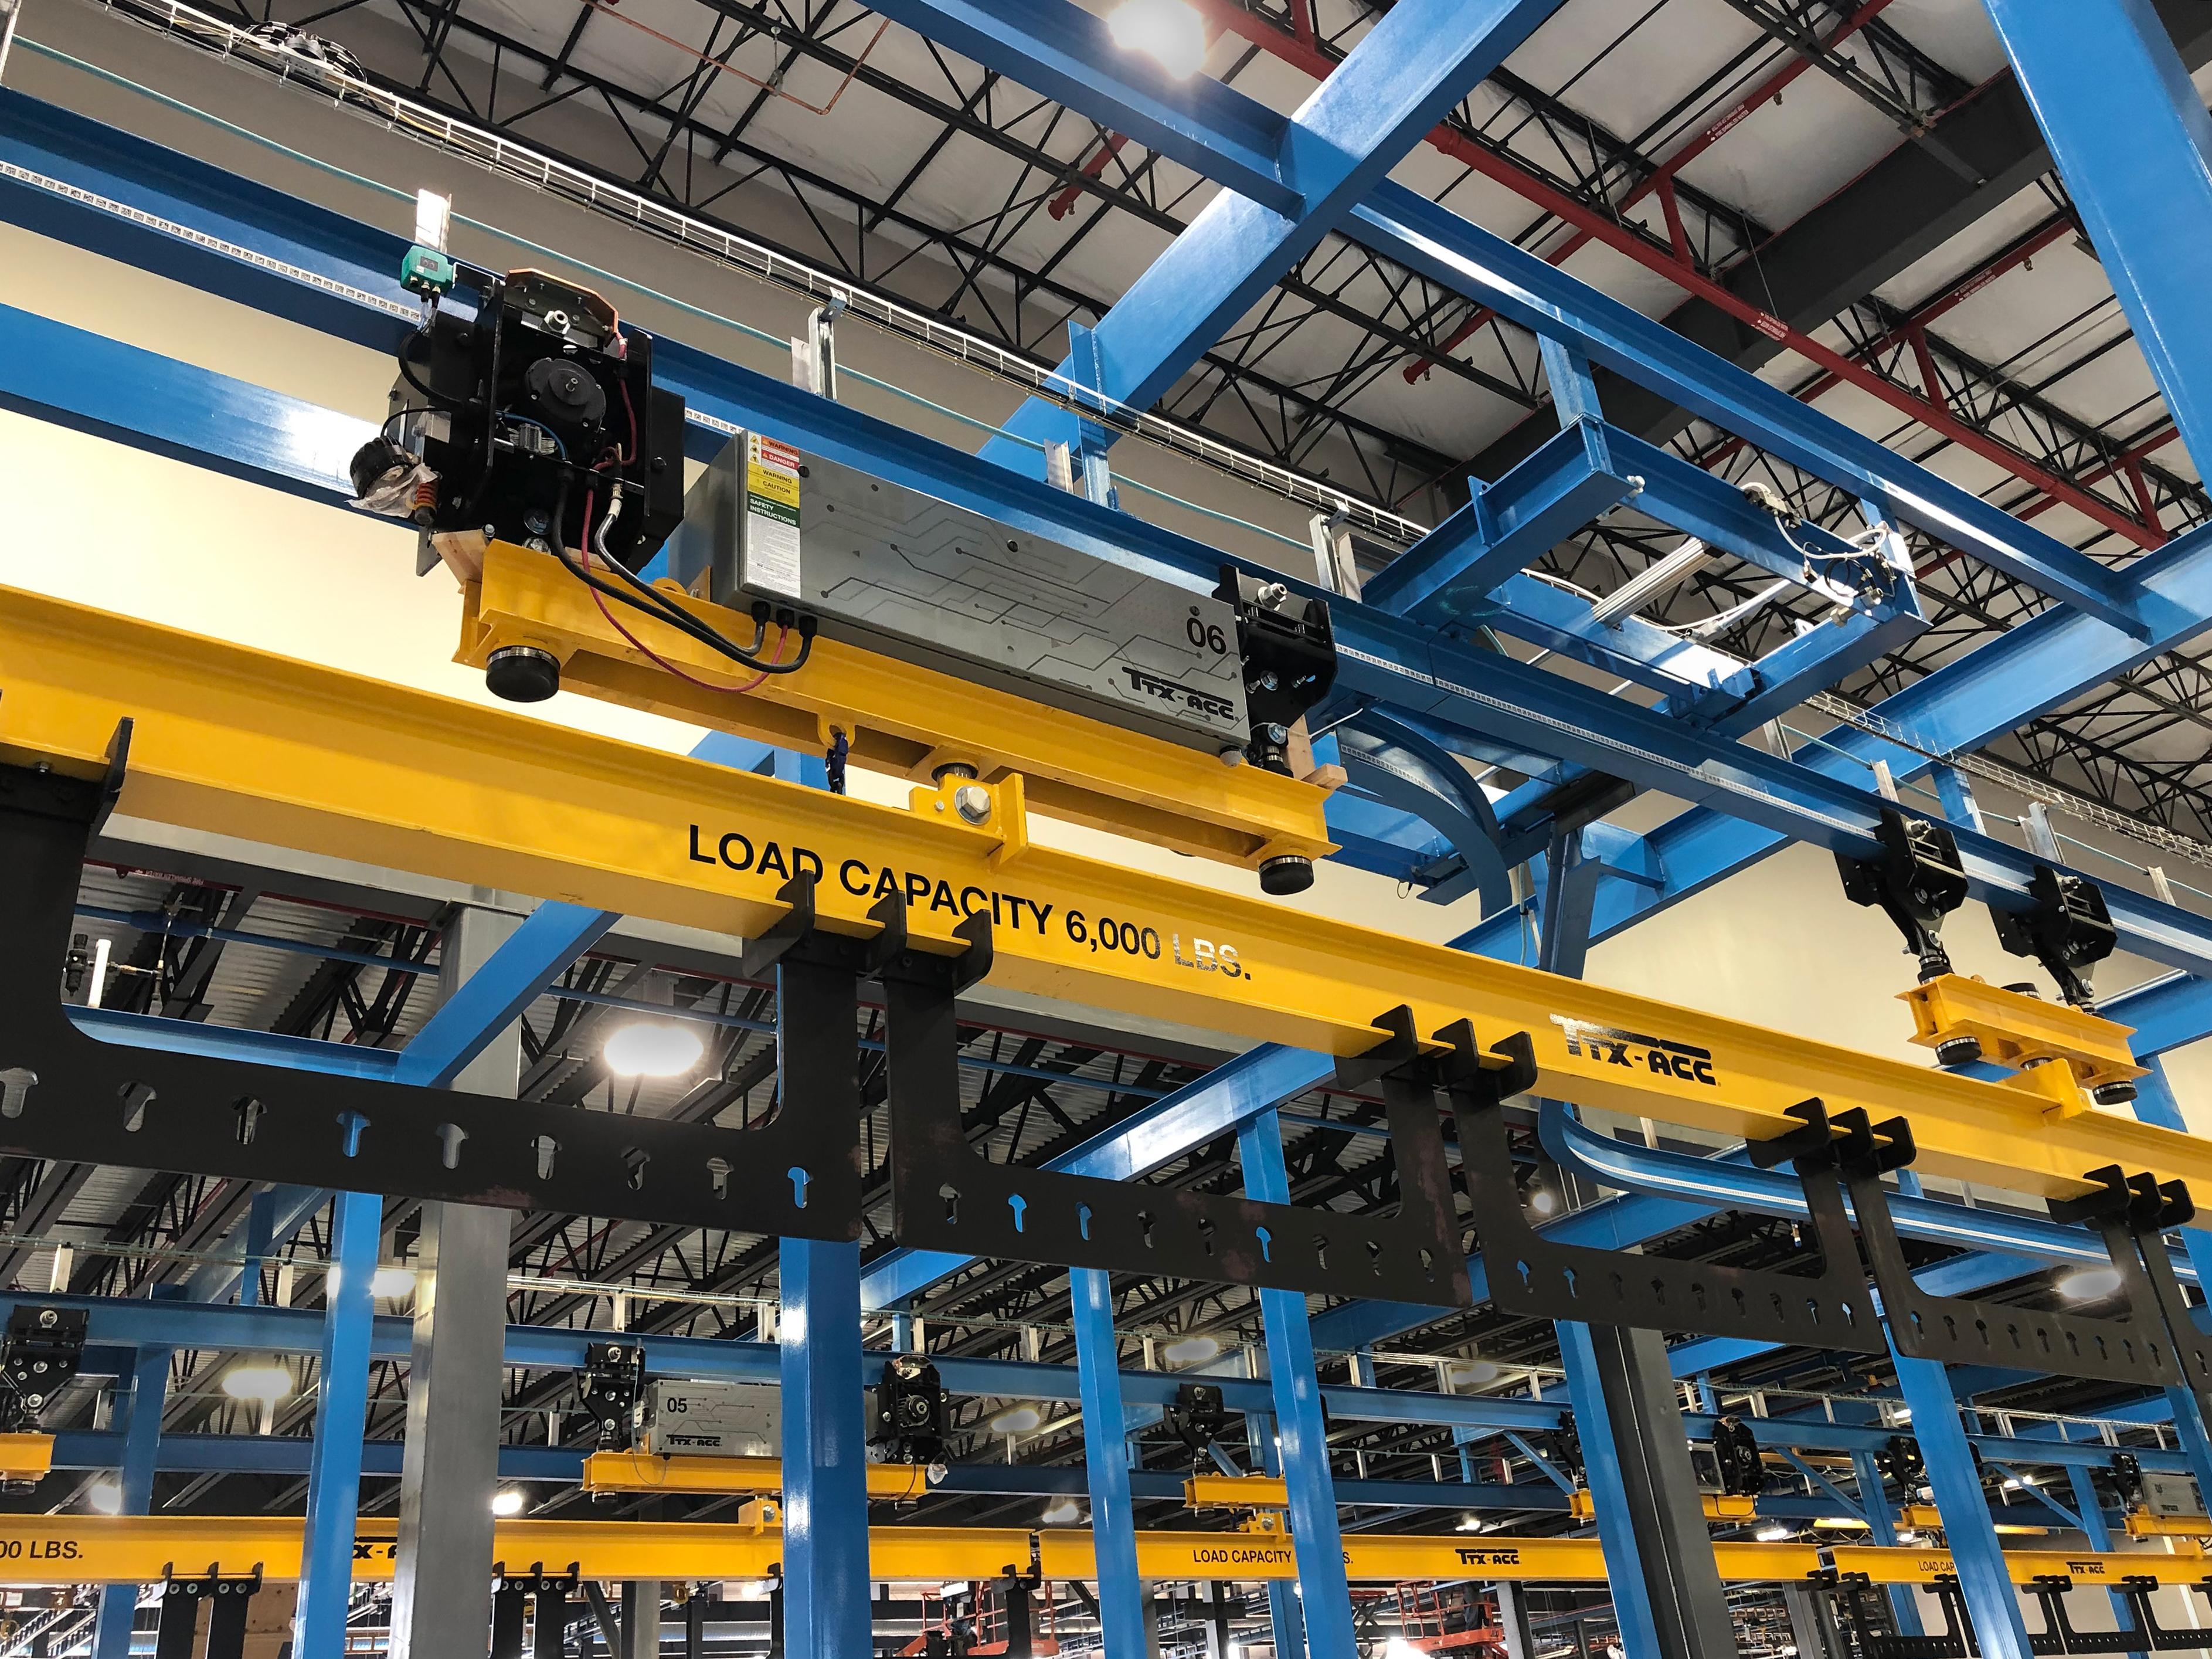 Therma-Tron-X Offers Wireless Conveyor System